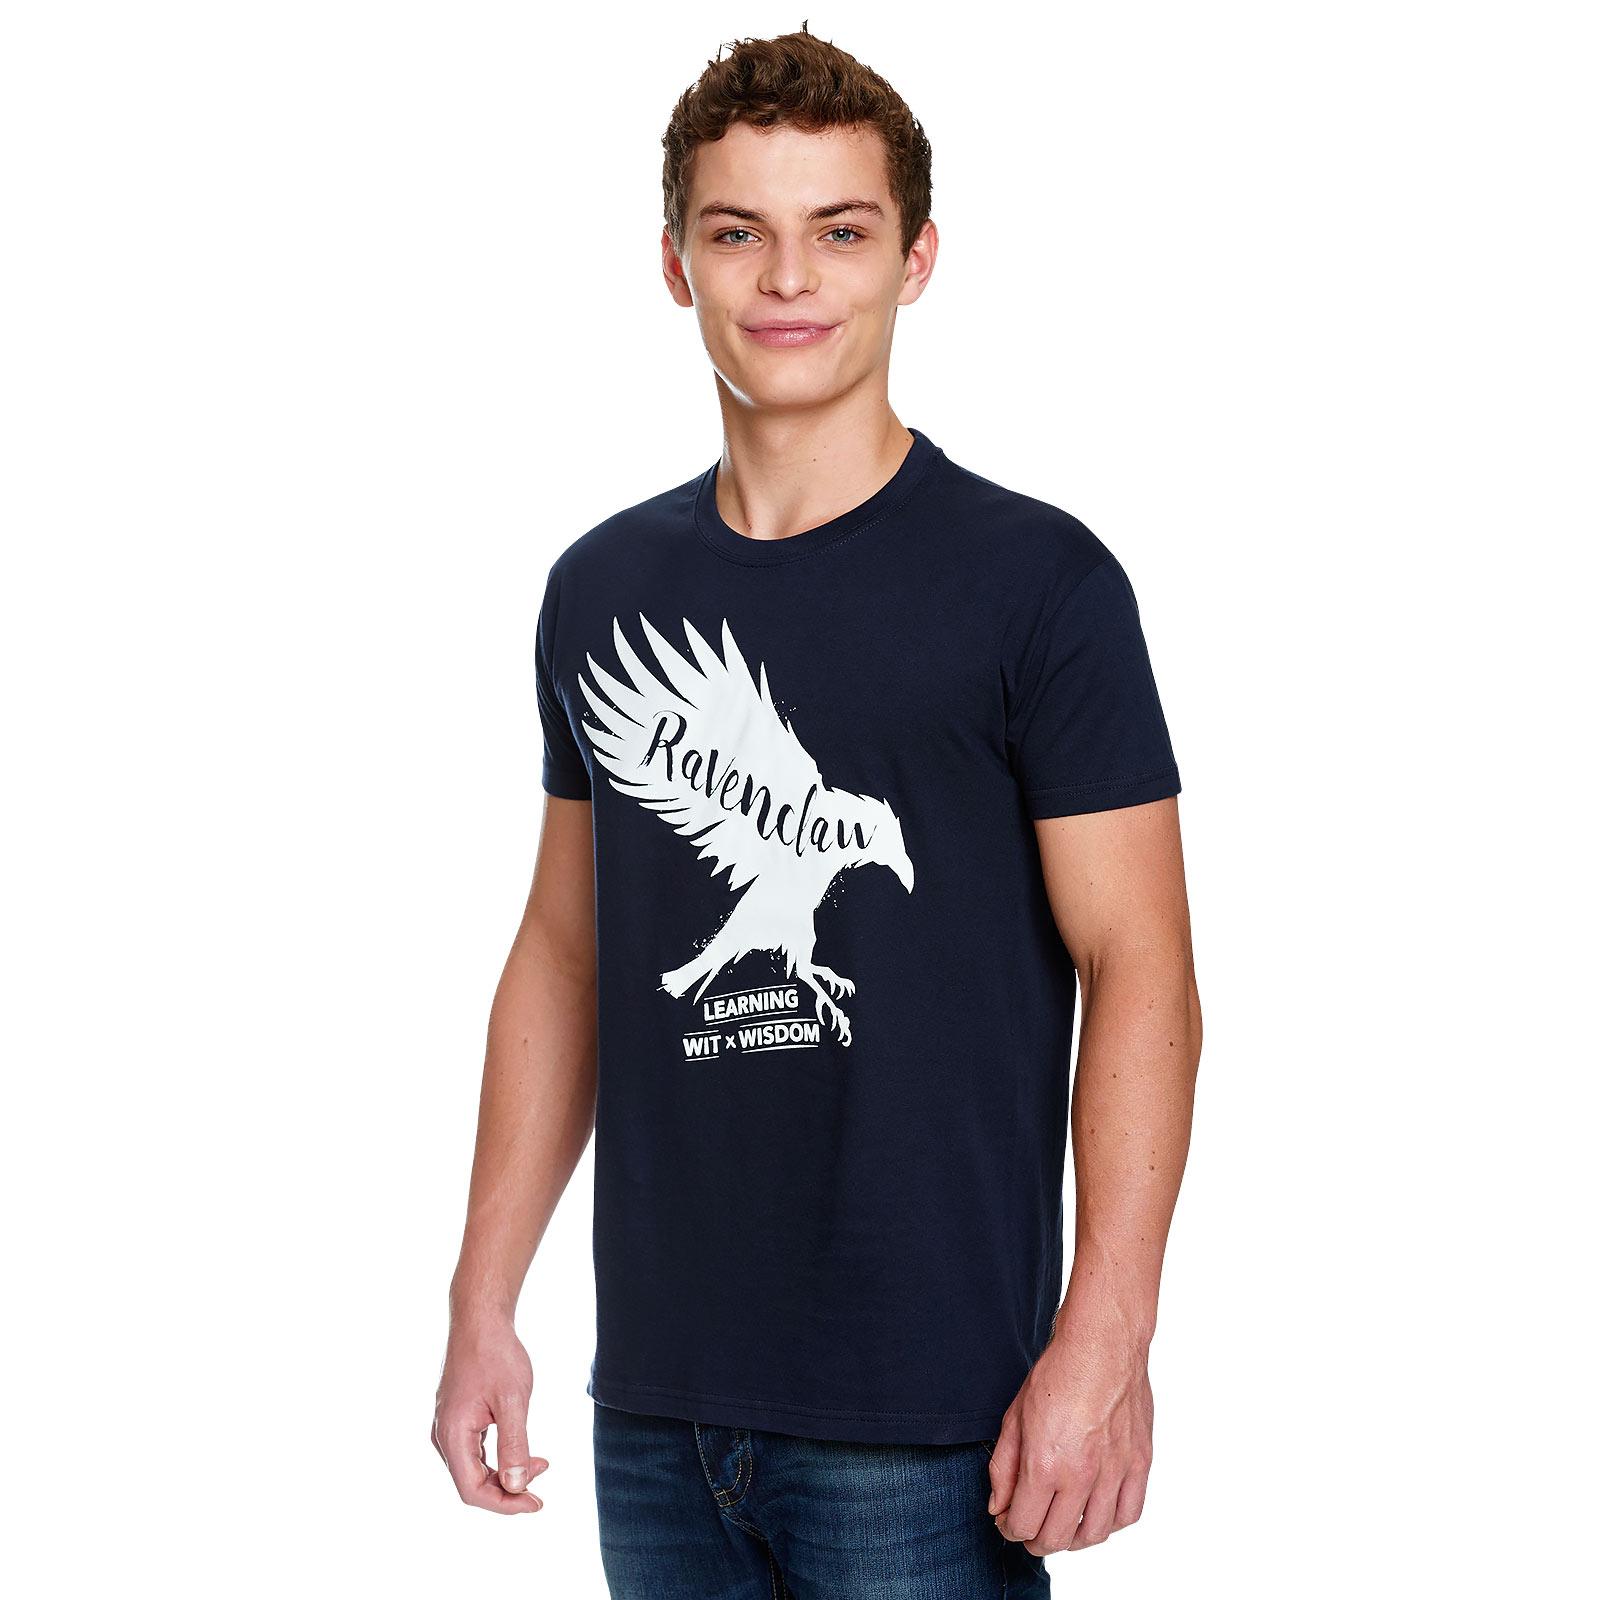 Harry Potter - Ravenclaw House Pride T-Shirt blau